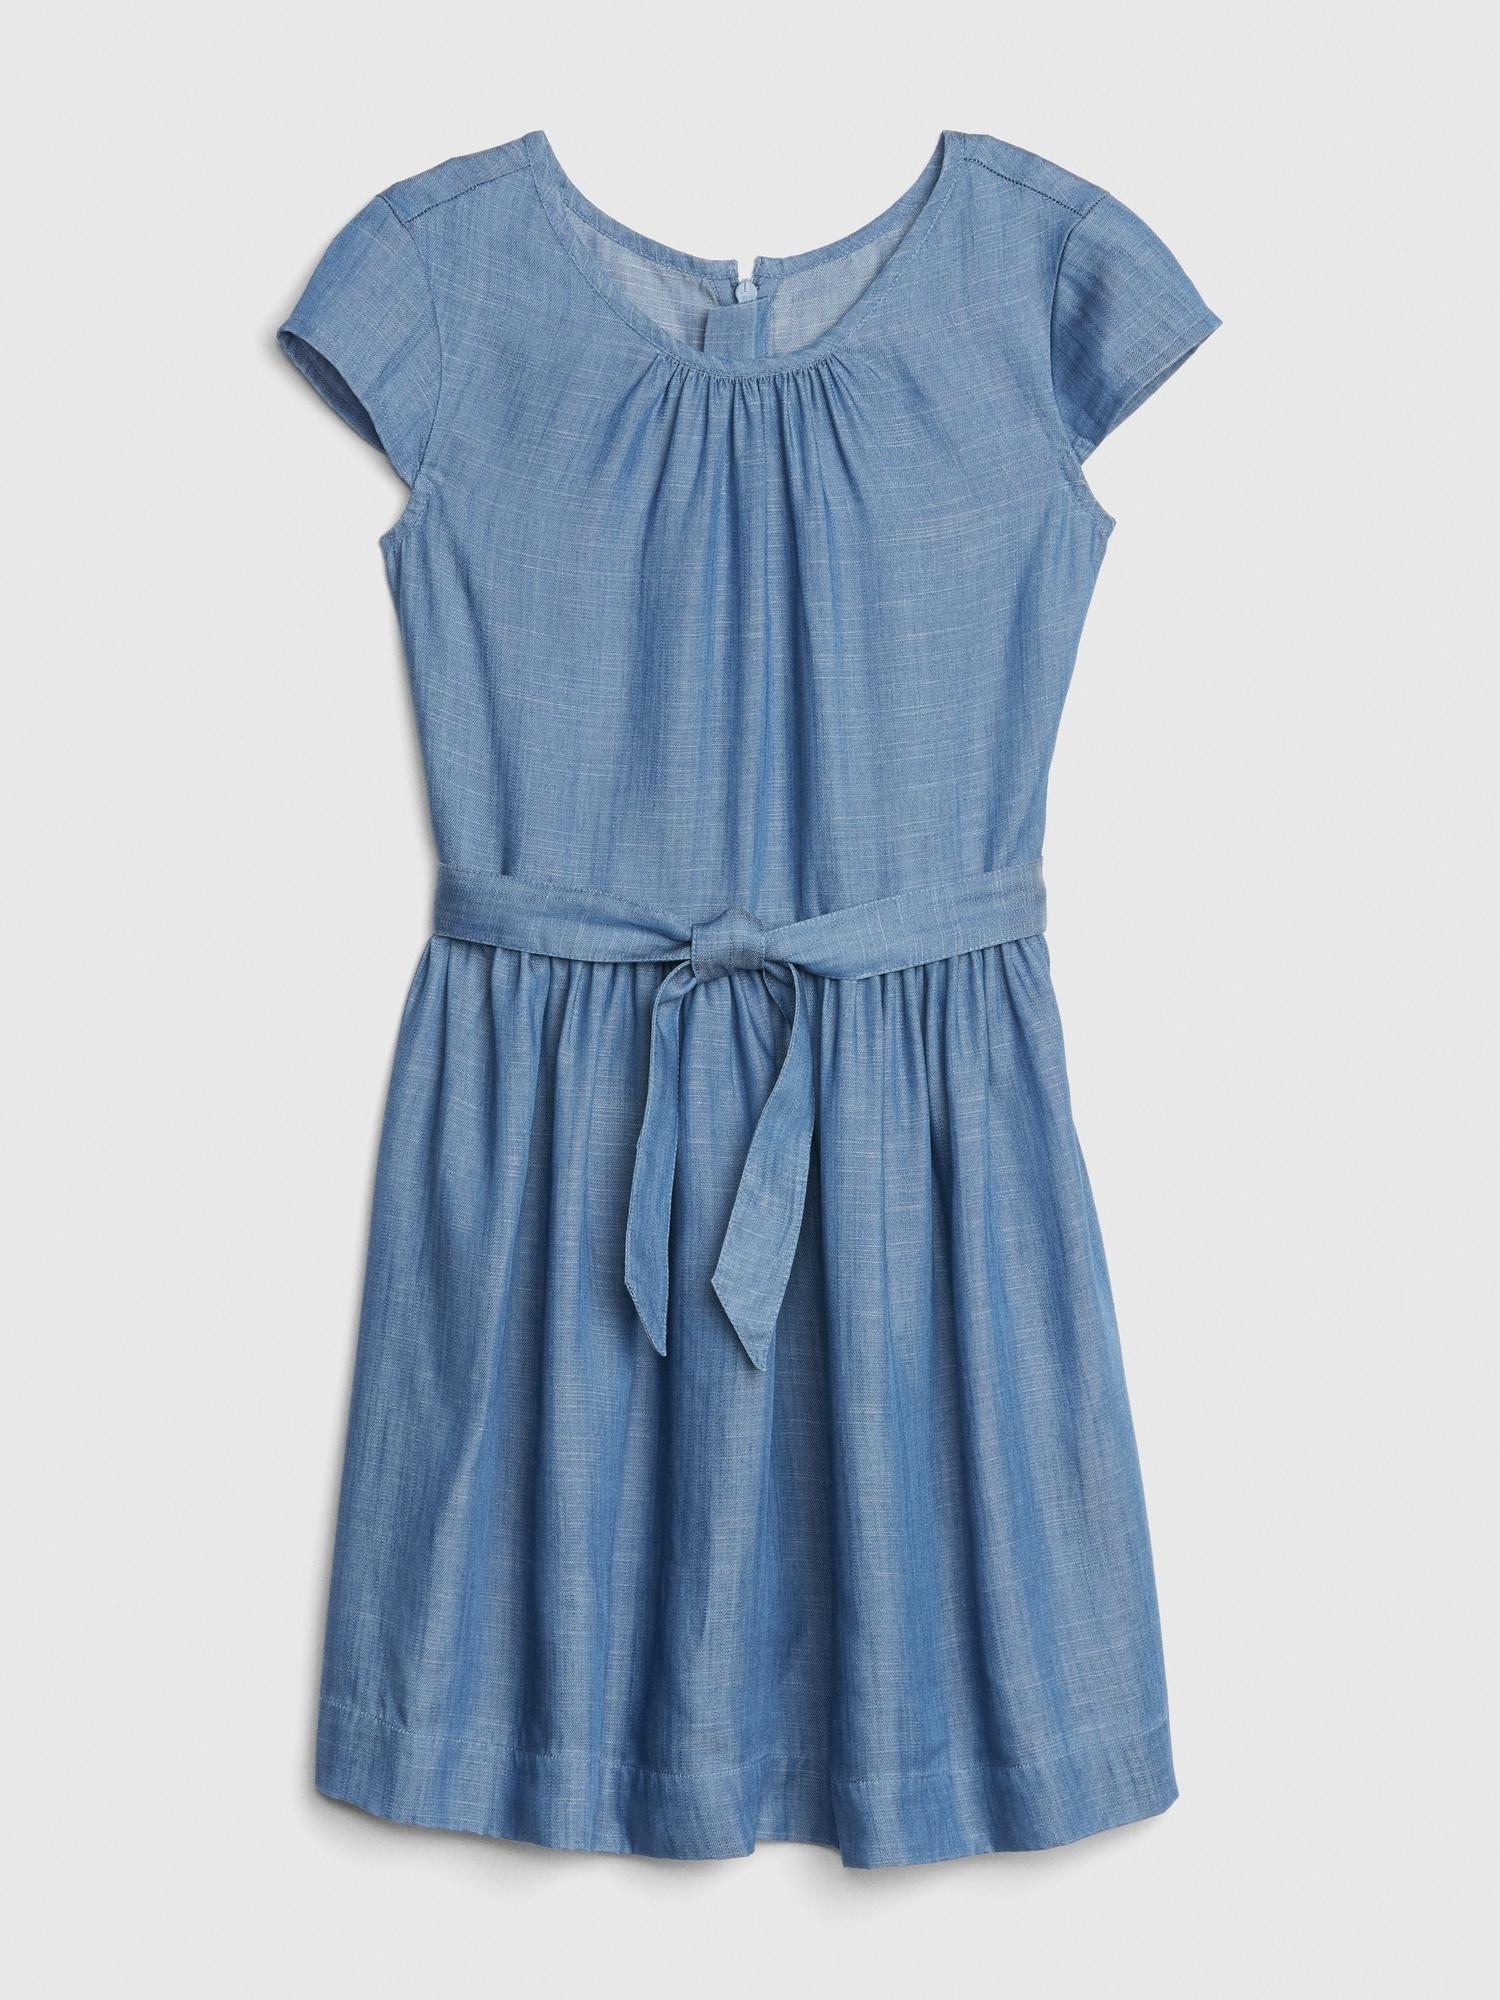 2ad98bf304 Denim Tie-Belt Dress